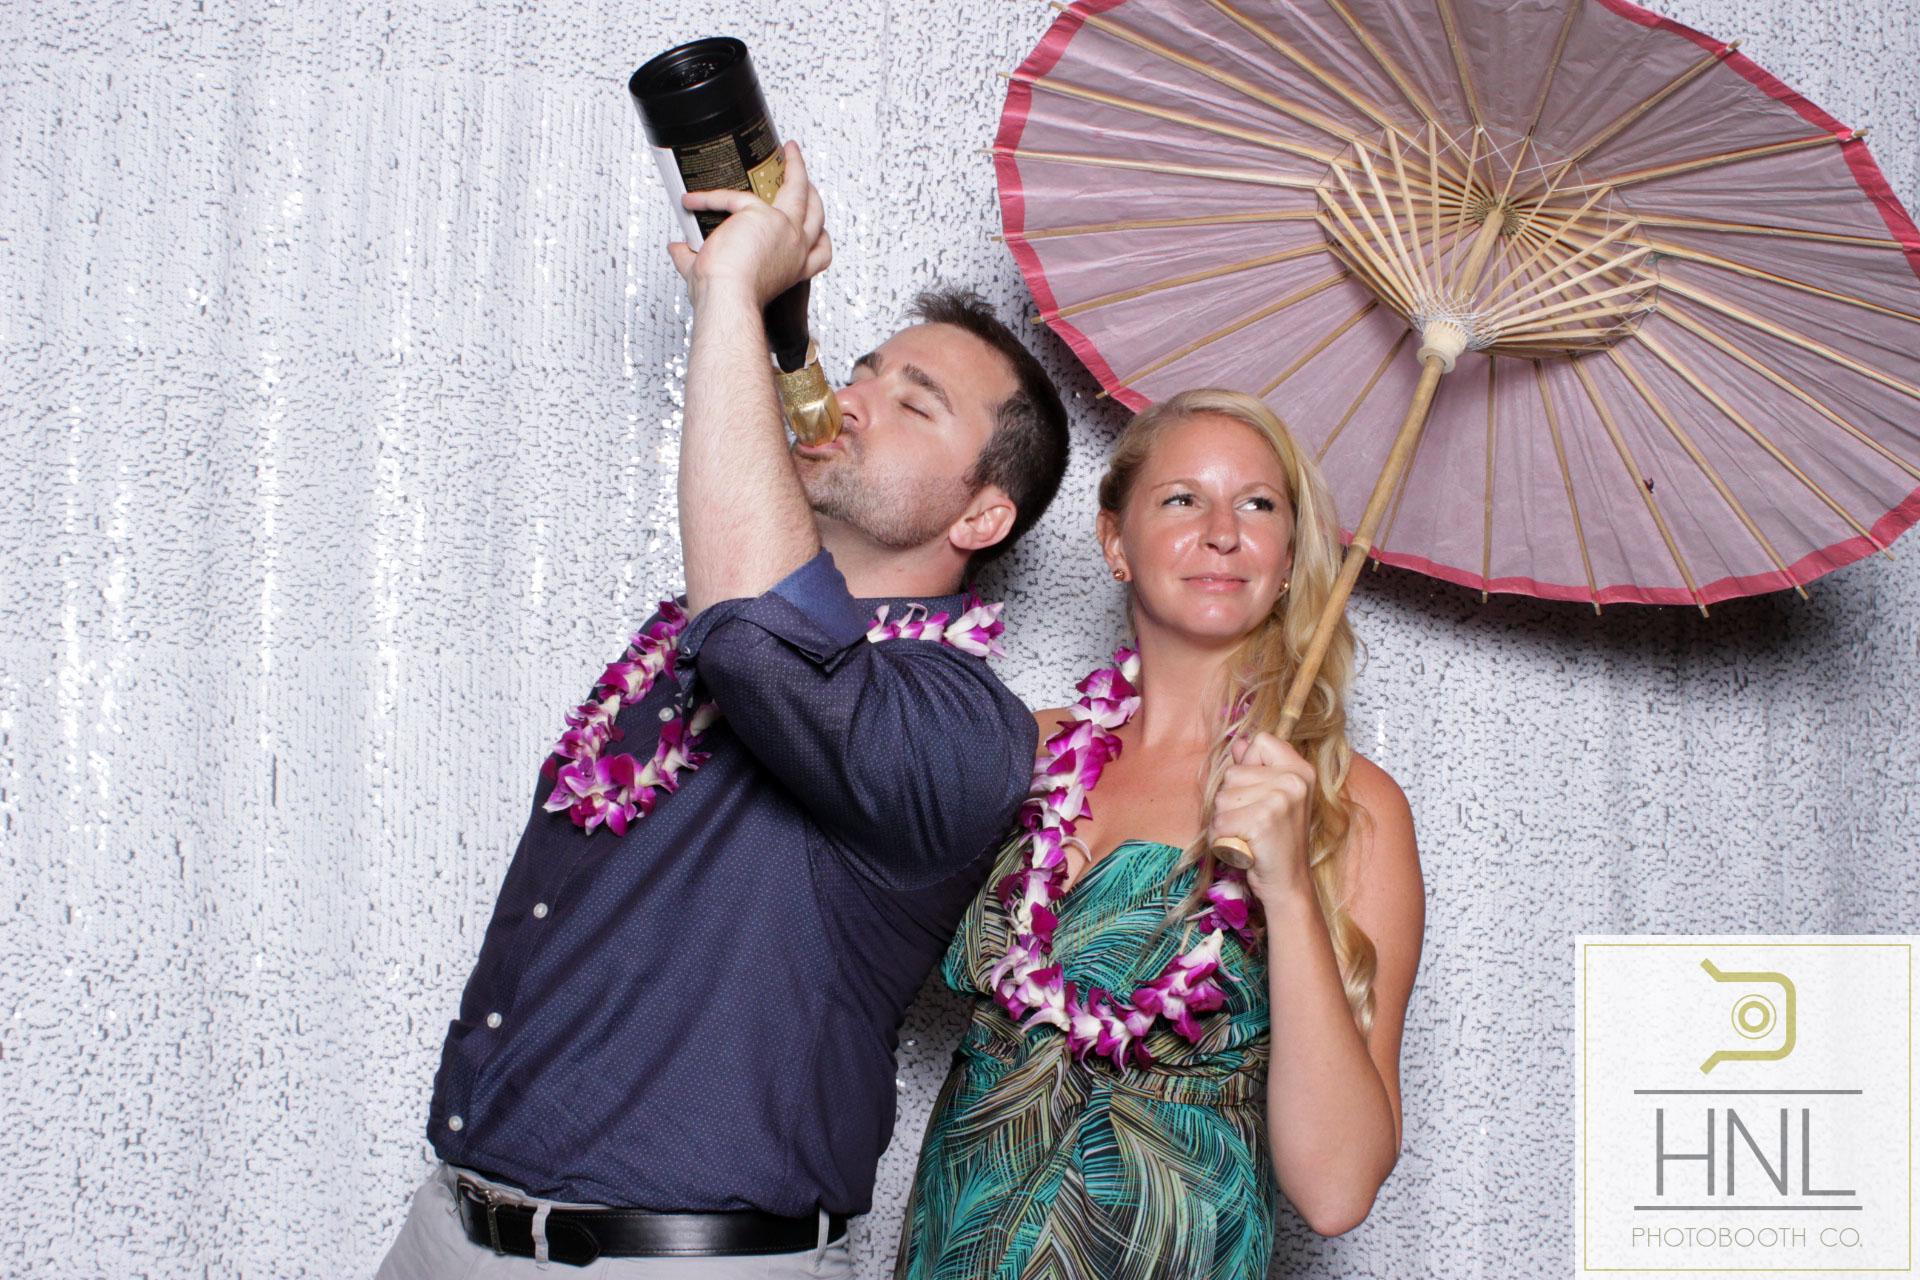 Miki and Dan wedding photo booth Lanikohonua Kapolei Oahu Hawaii  (30).jpg